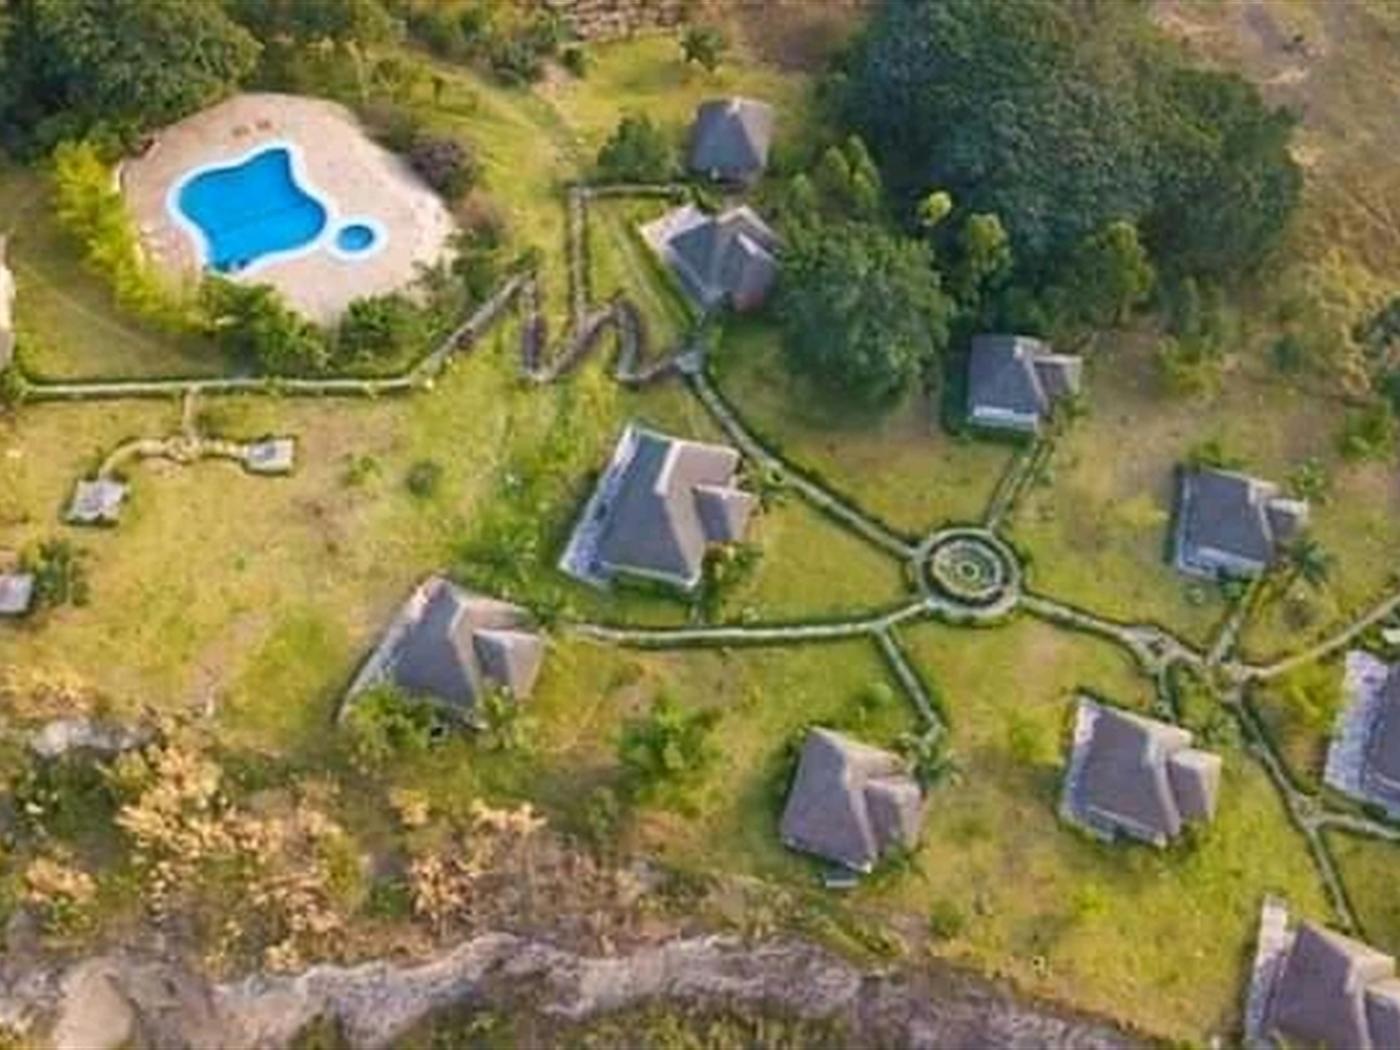 Hotel for sale in Fortportal Kasese